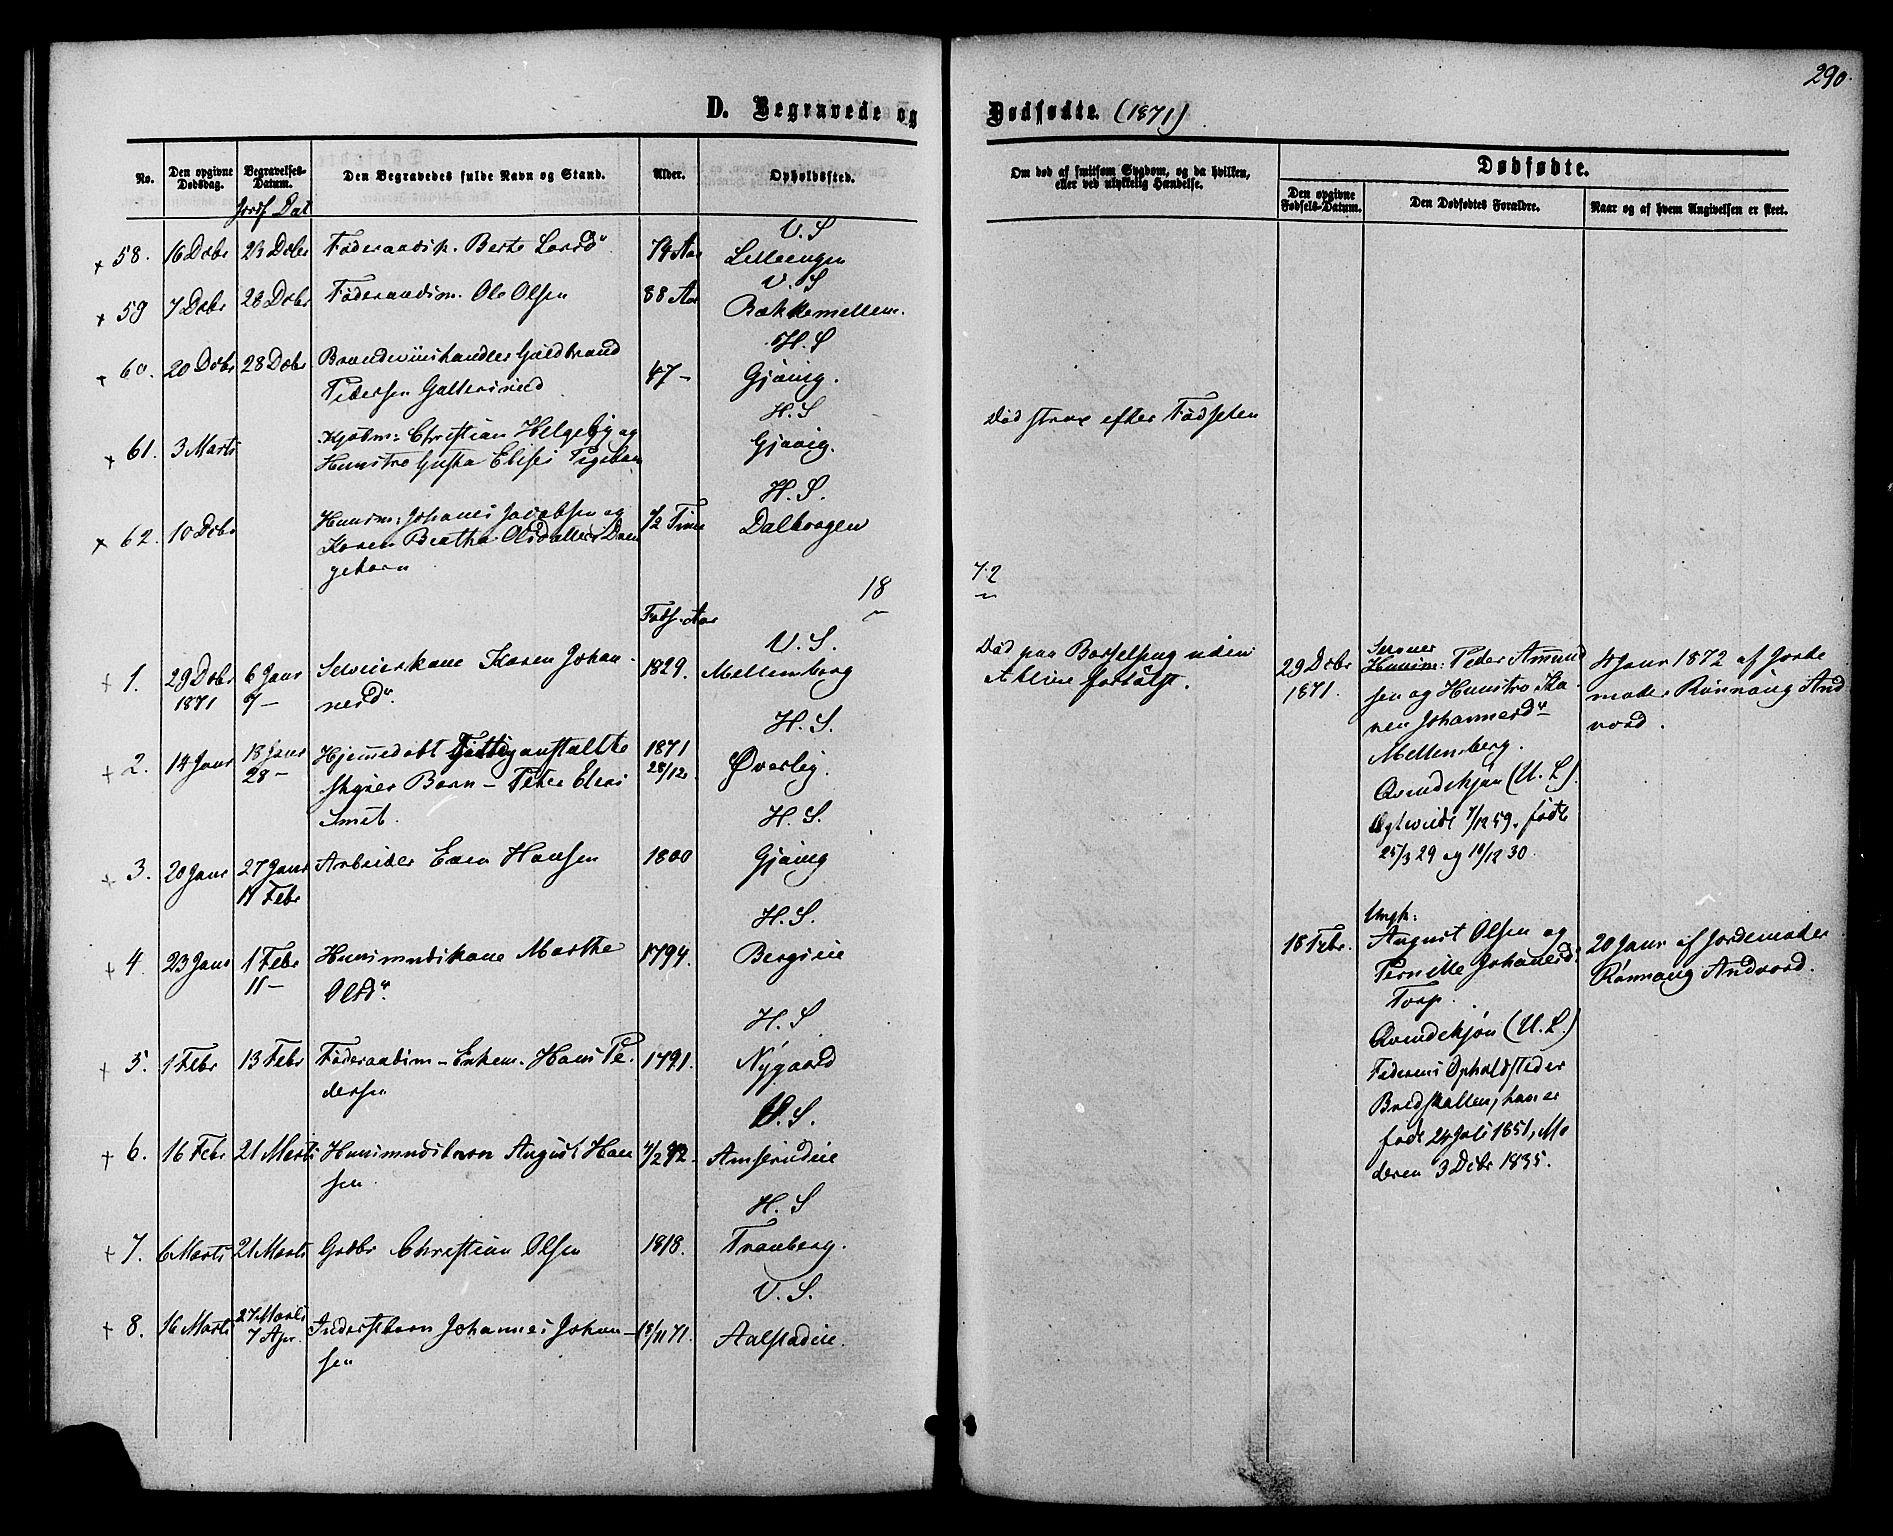 SAH, Vardal prestekontor, H/Ha/Haa/L0007: Ministerialbok nr. 7, 1867-1878, s. 290